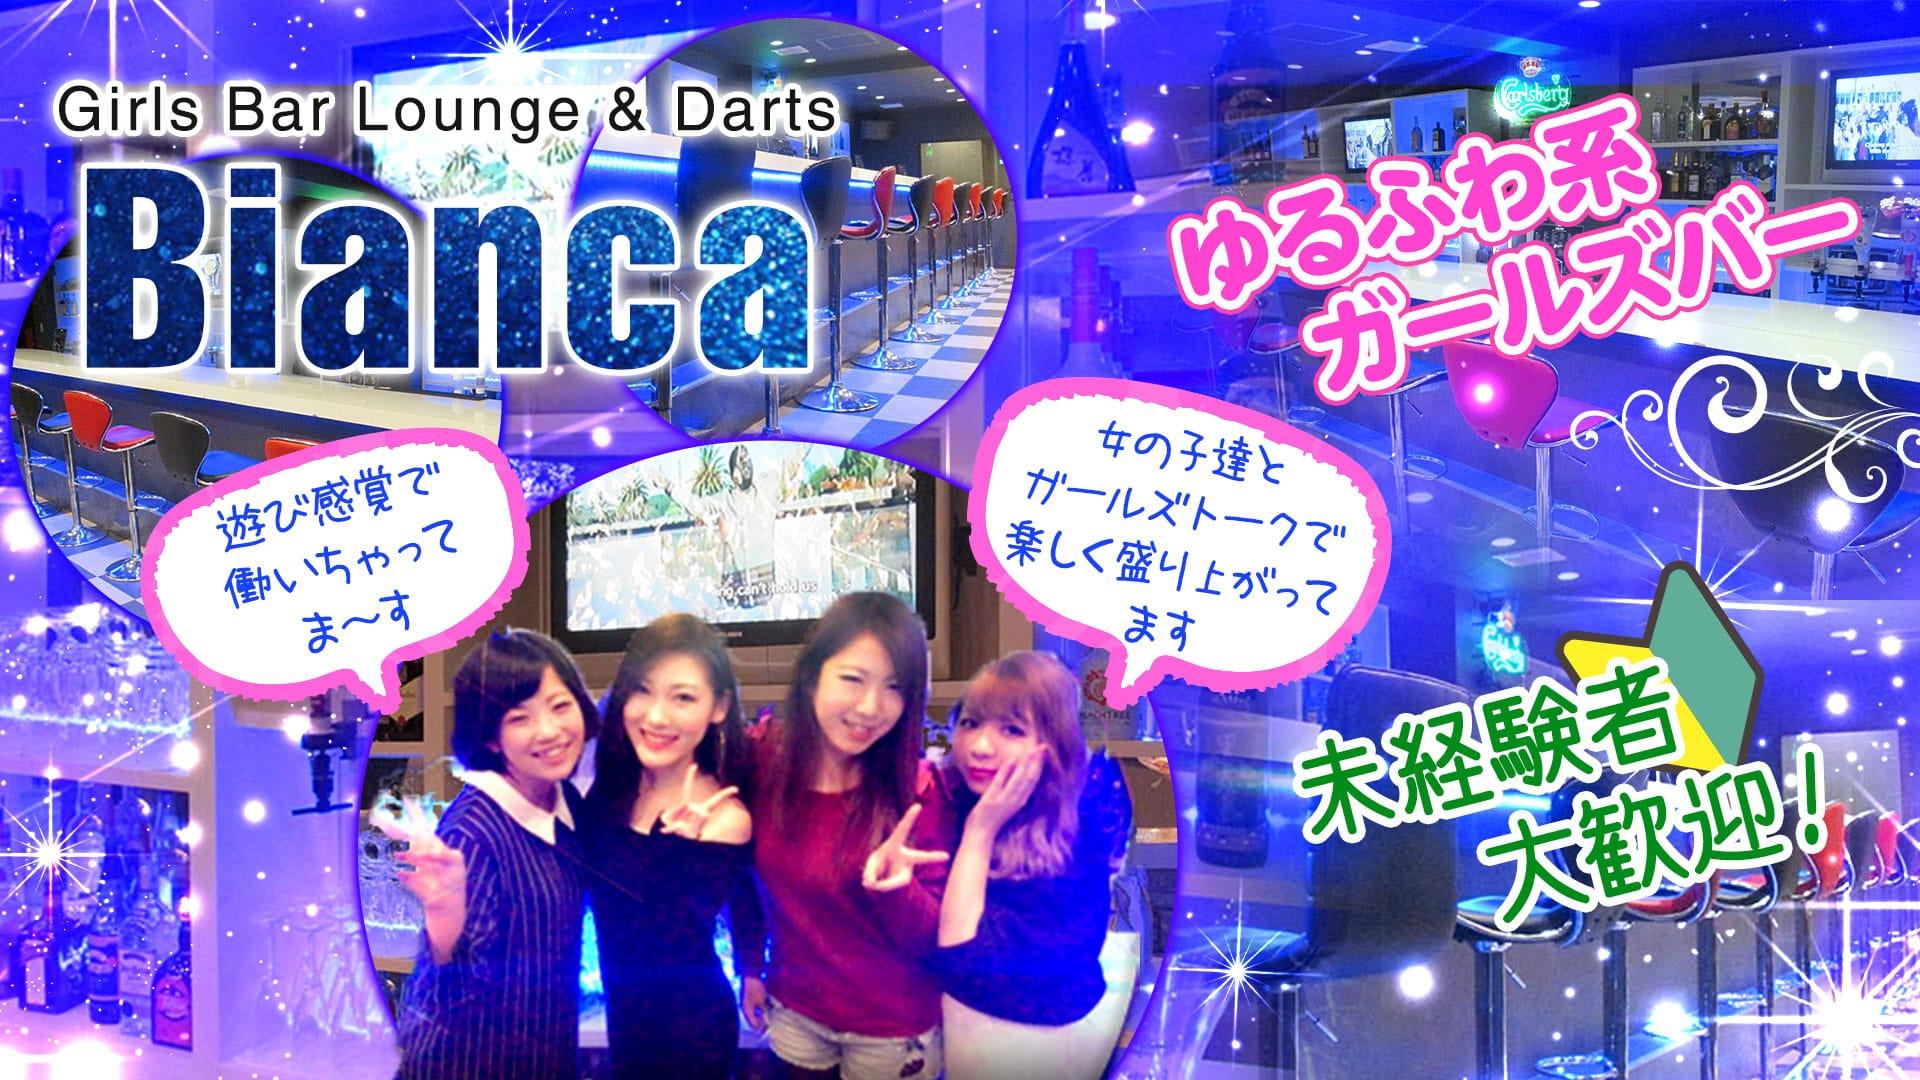 Girls Bar Lounge & Darts -Bianca-(ビアンカ) 川崎ガールズバー TOP画像